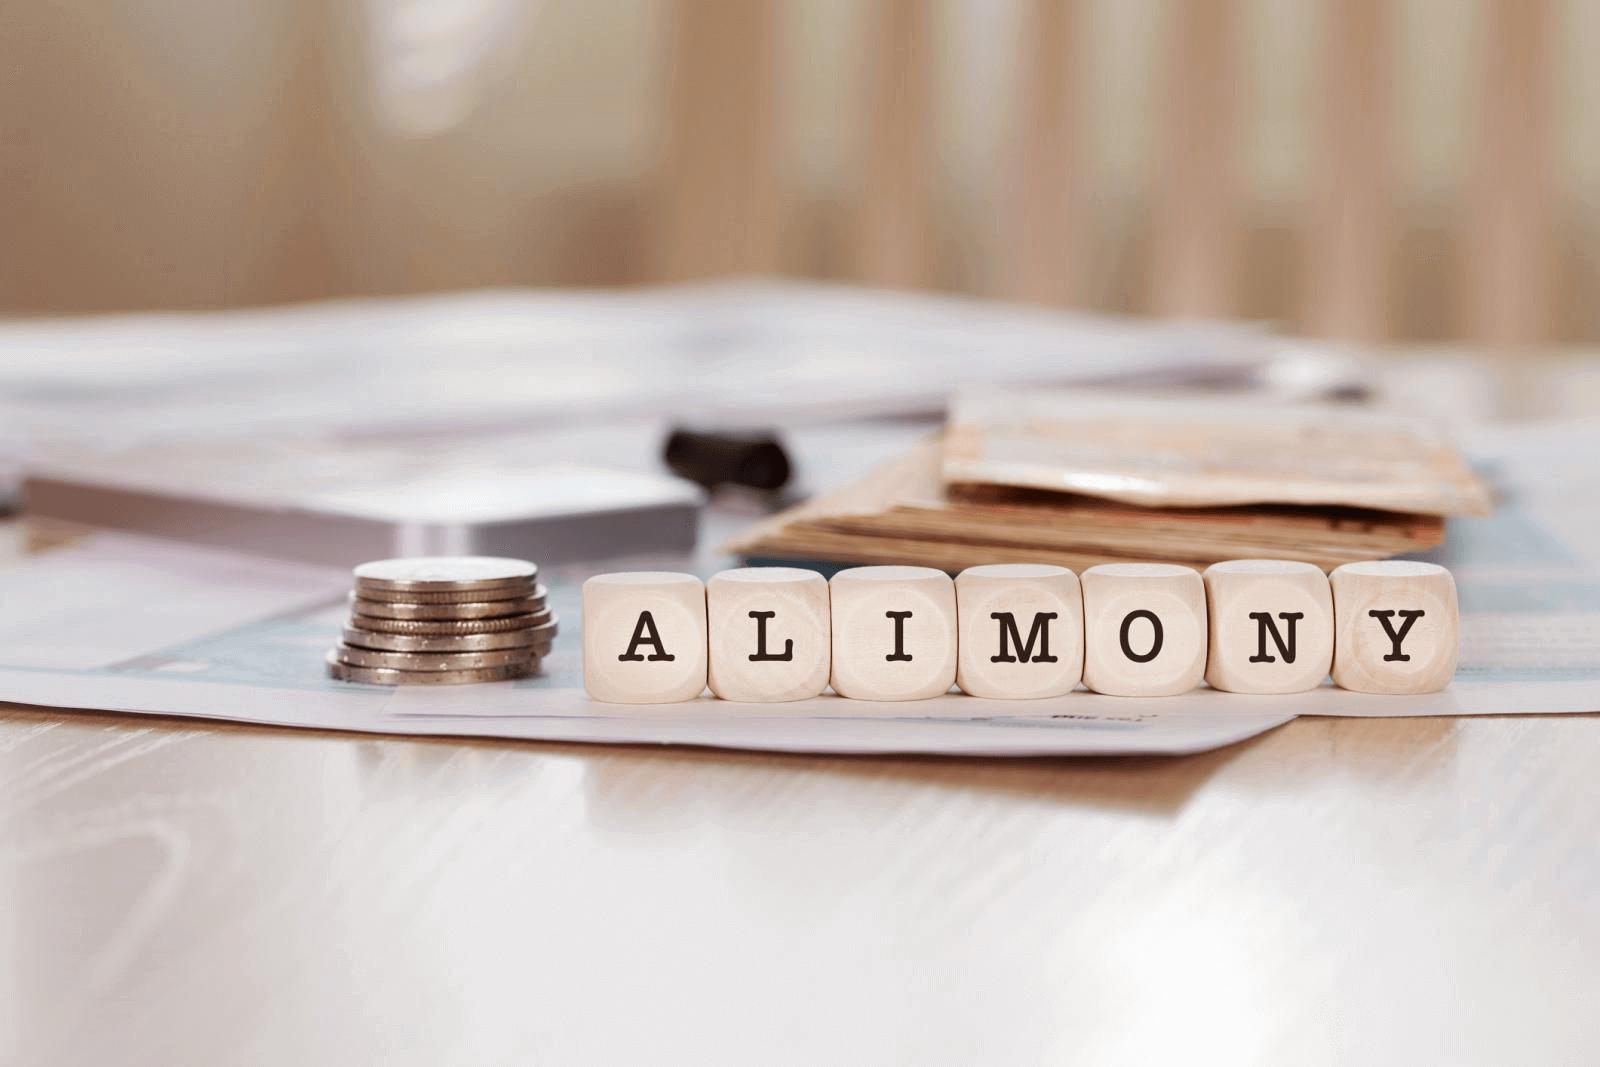 calculating alimony in California calculating alimony in california Calculating Alimony in California calculating alimoni in California